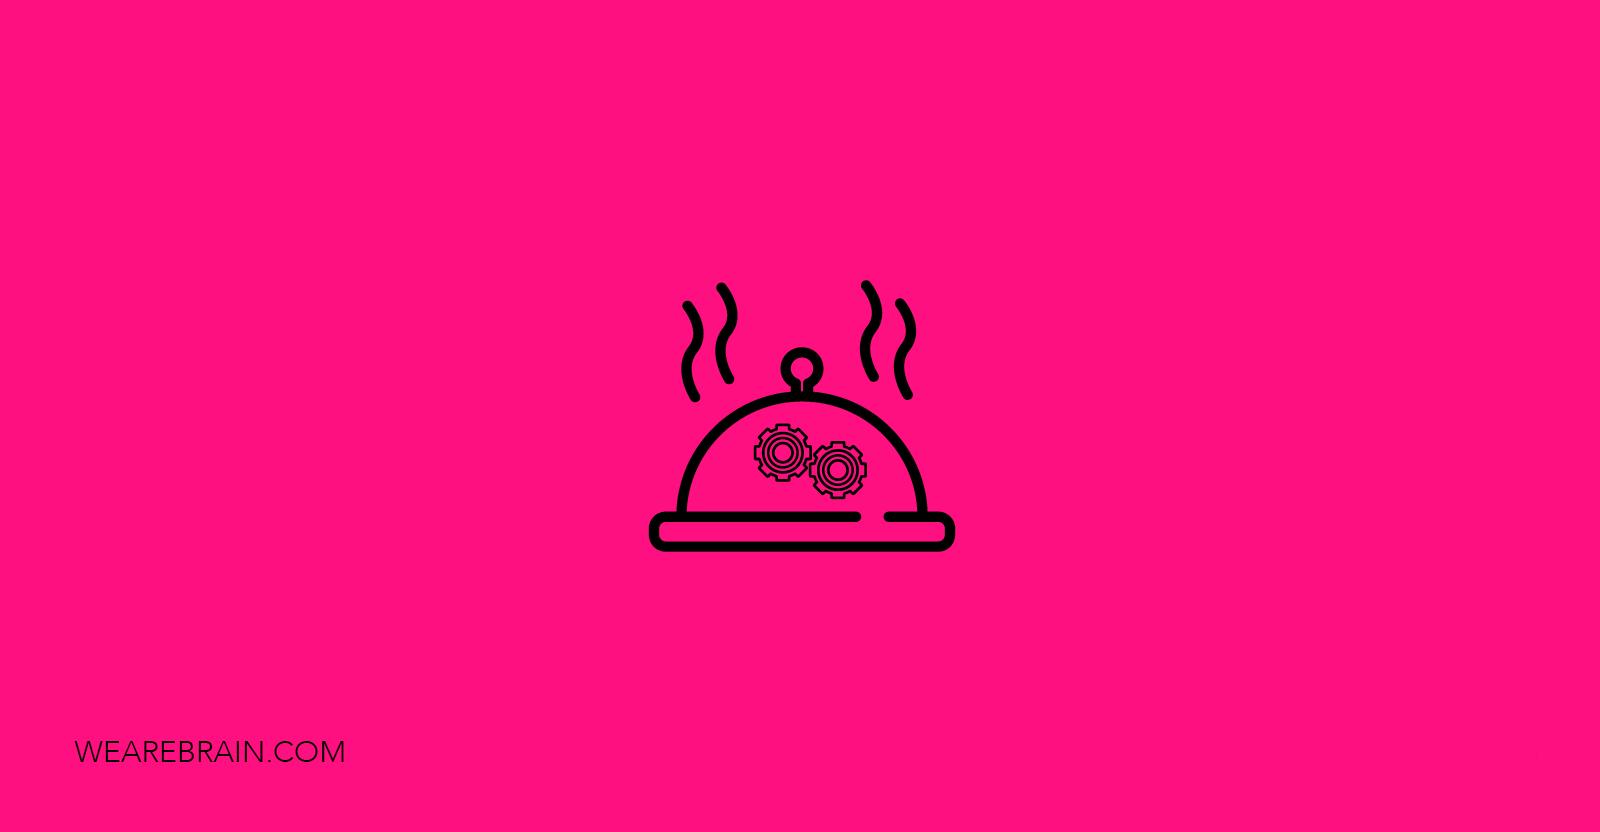 illustration of a cloche